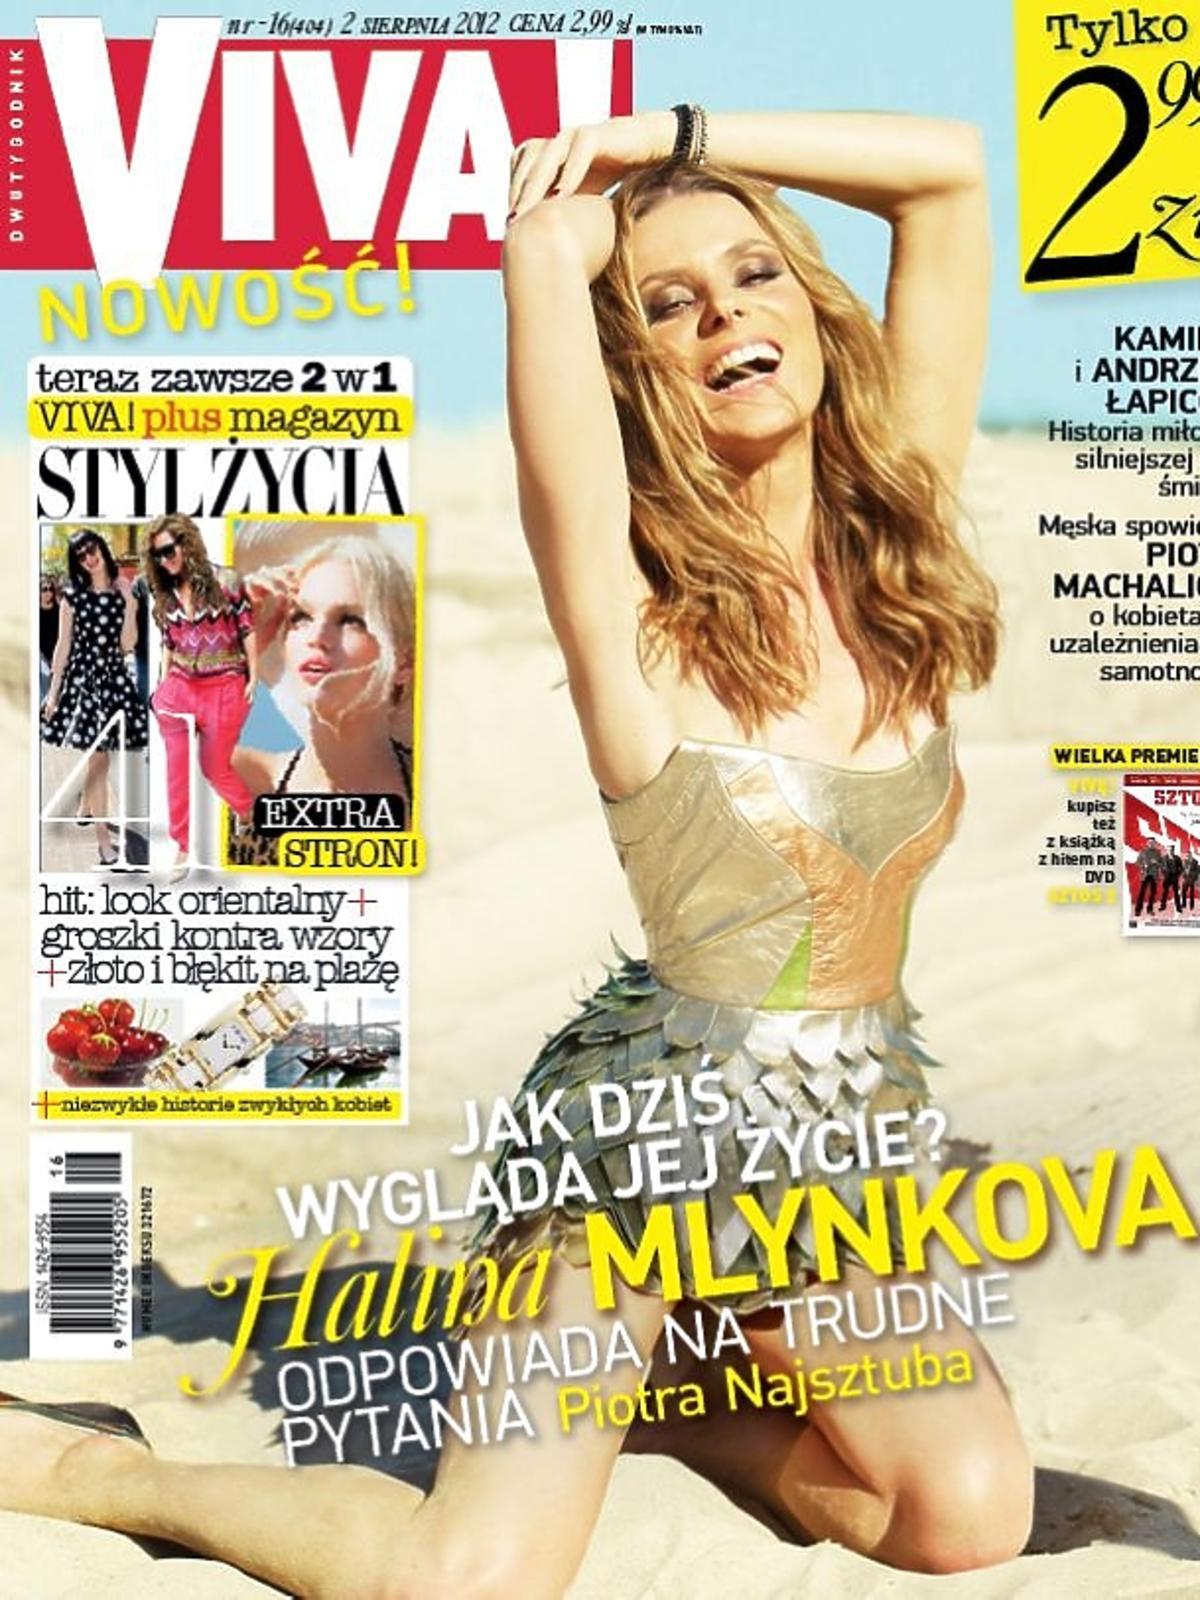 Halina Mlynkova na okładce